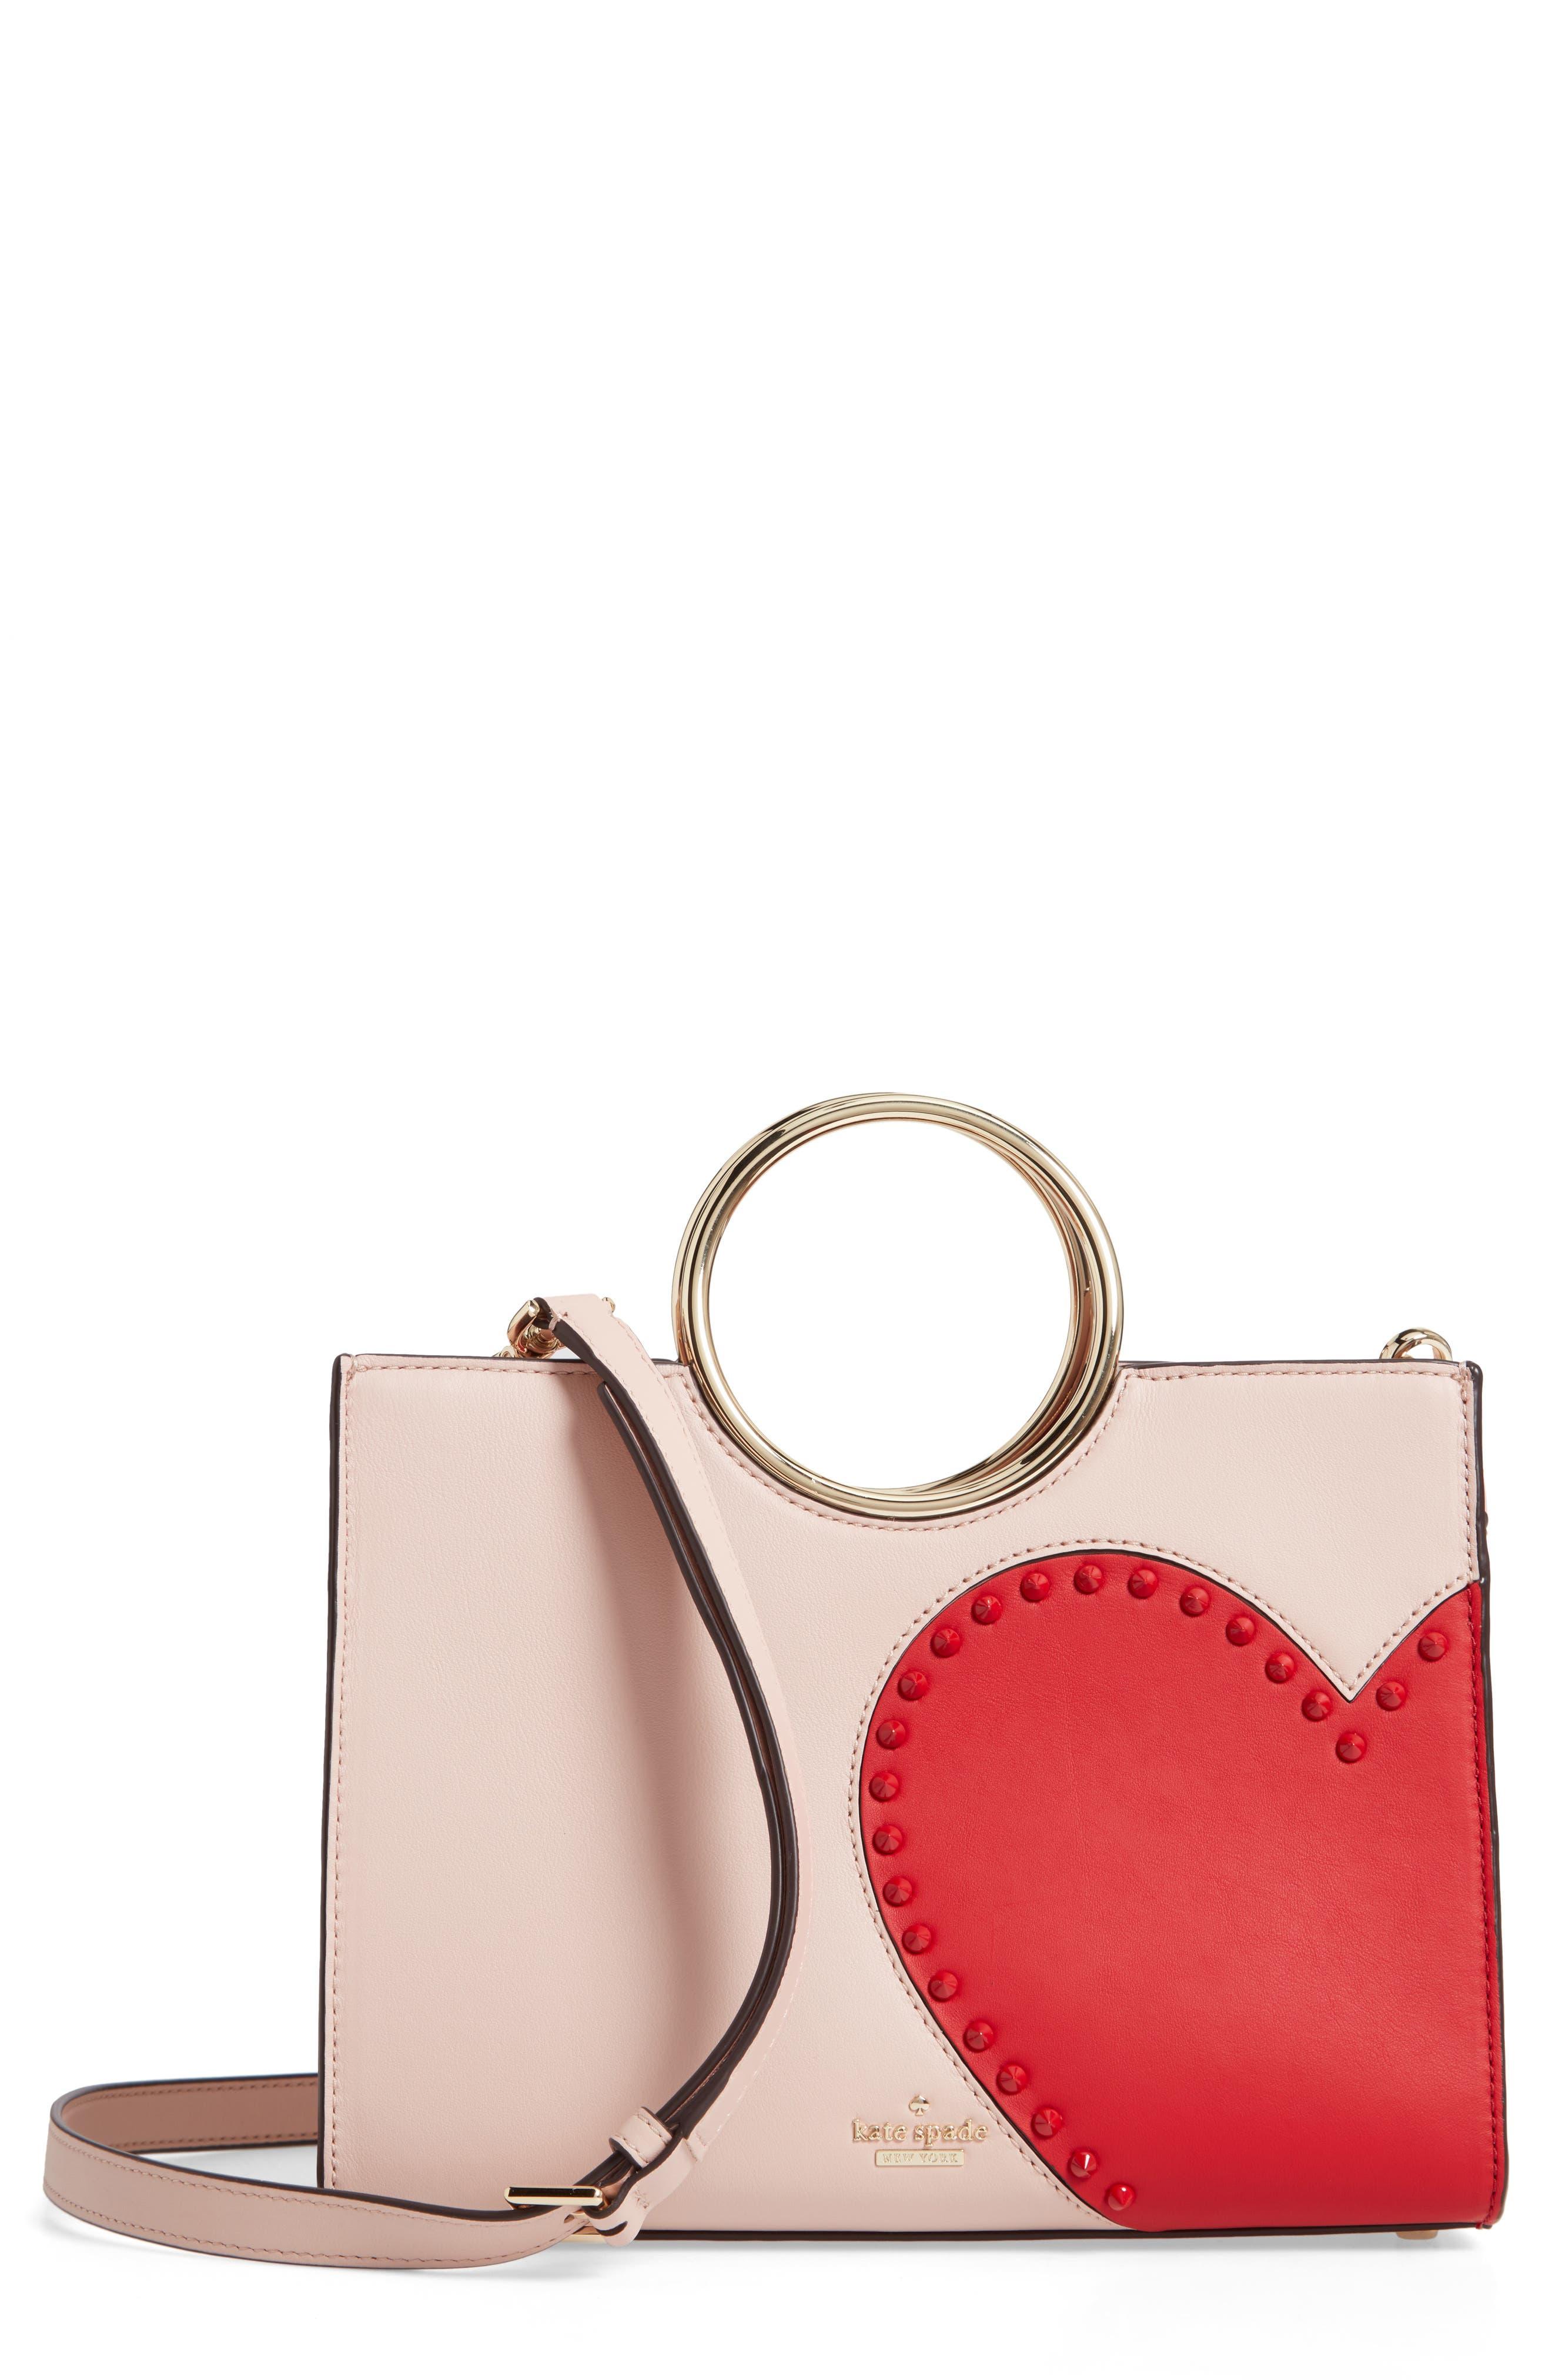 KATE SPADE NEW YORK heart it - sam leather satchel, Main, color, 650